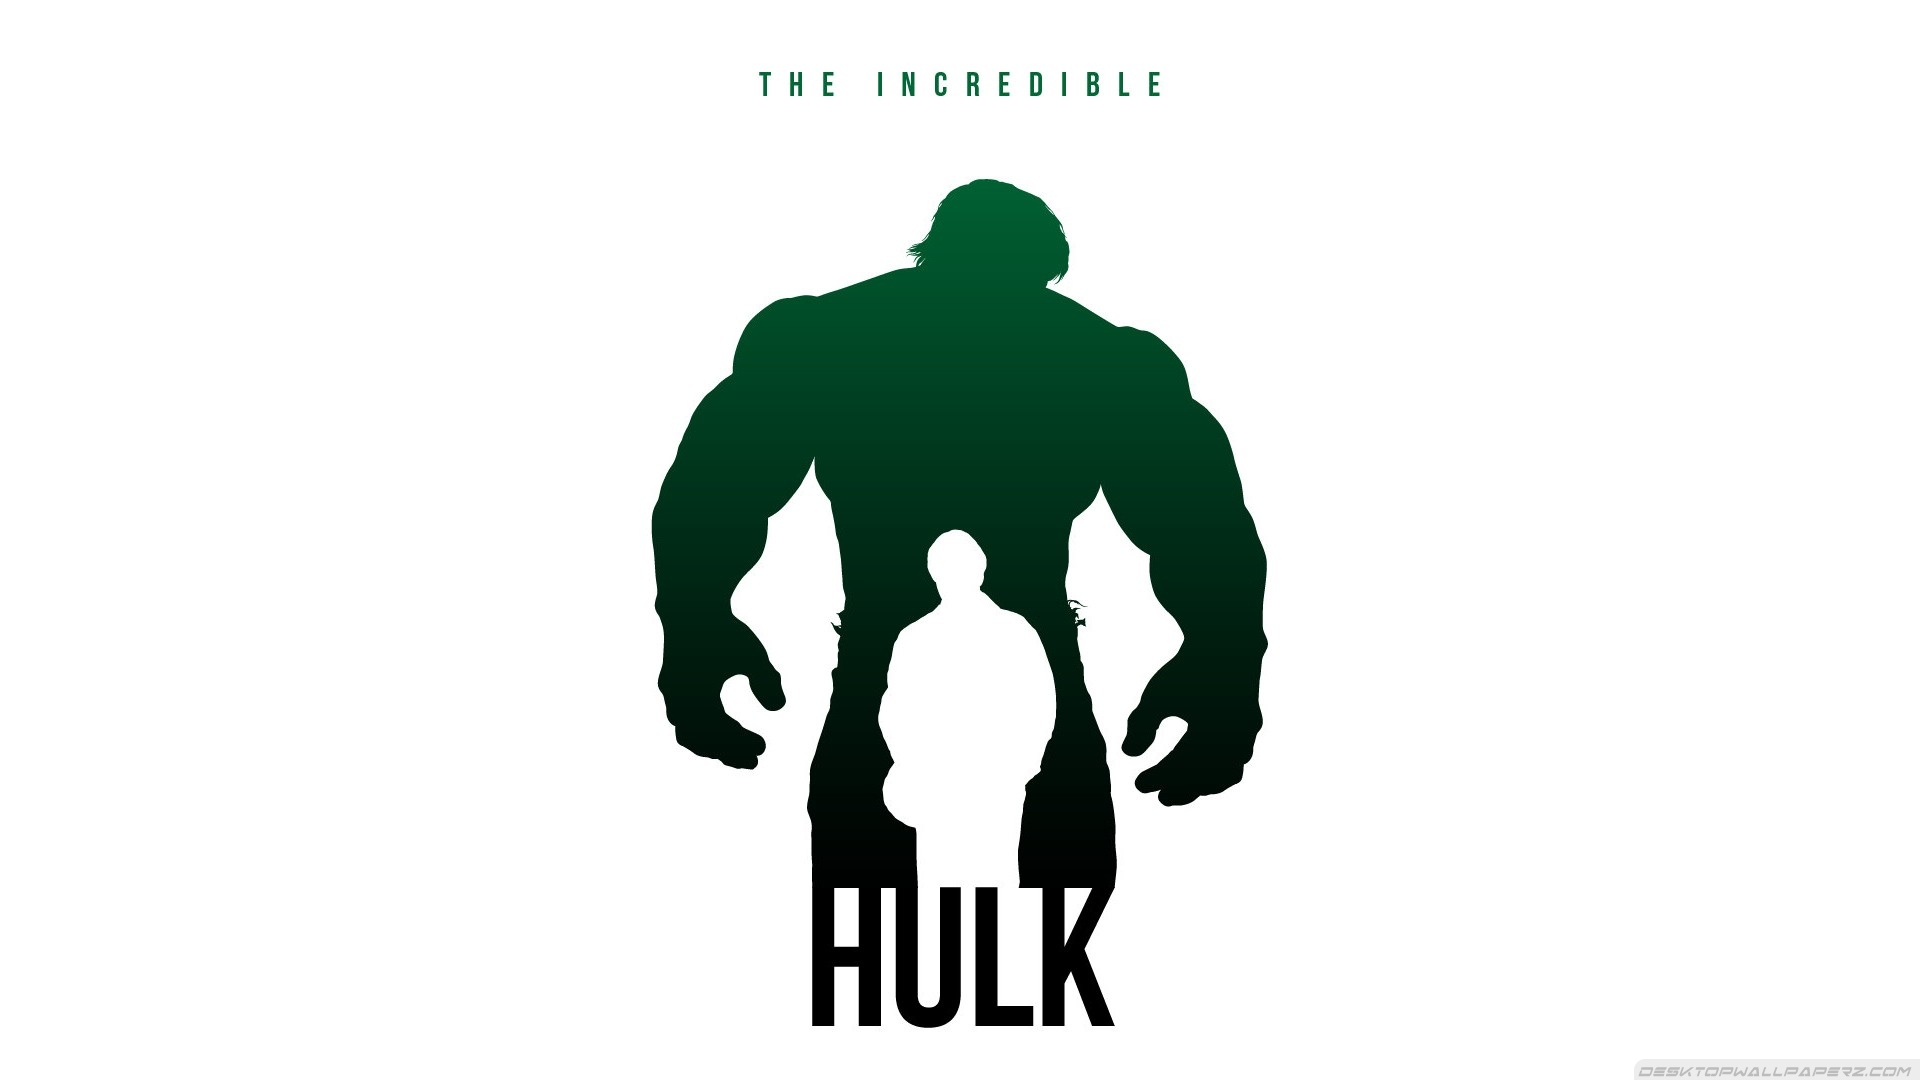 Minimalistic Marvel Comics Avengers Posters Fan Art The Incredible 1920x1080